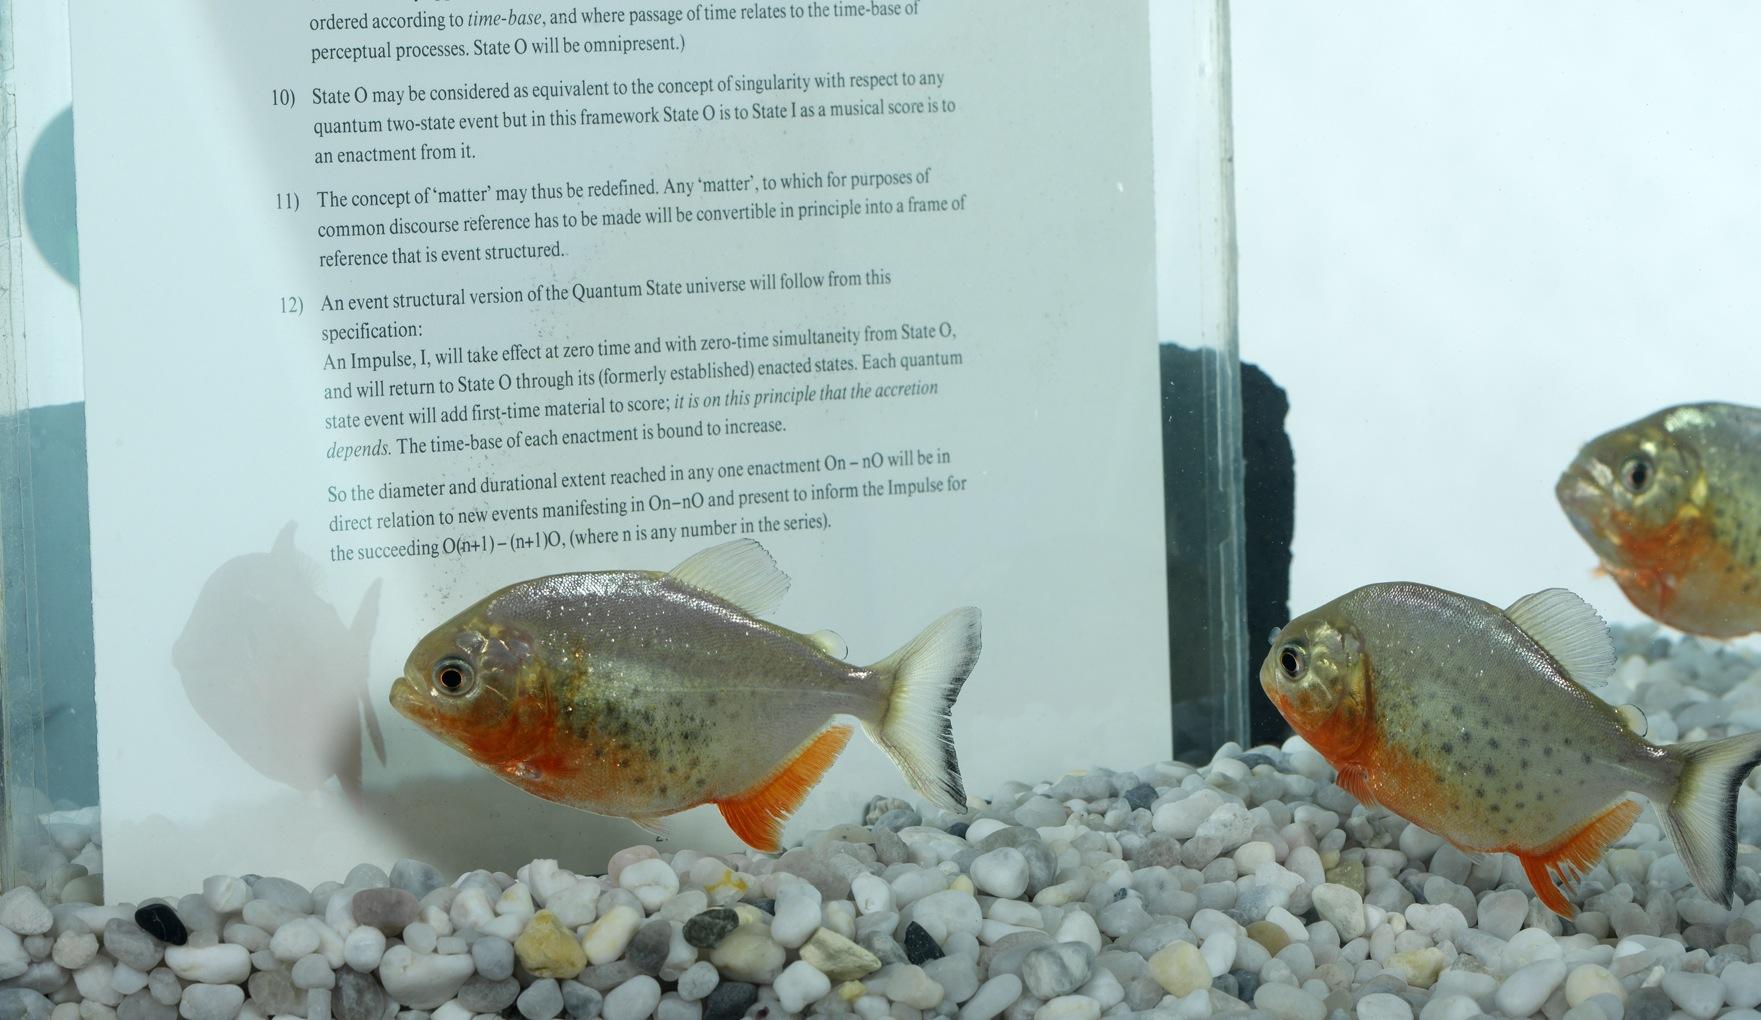 John LathamThey're learning fast (1988) Fish-tank, pages from 'Report of a Surveyor', piranhas Photo: Ken Adlard (MFI GRADUATE AWARD 2013 0)